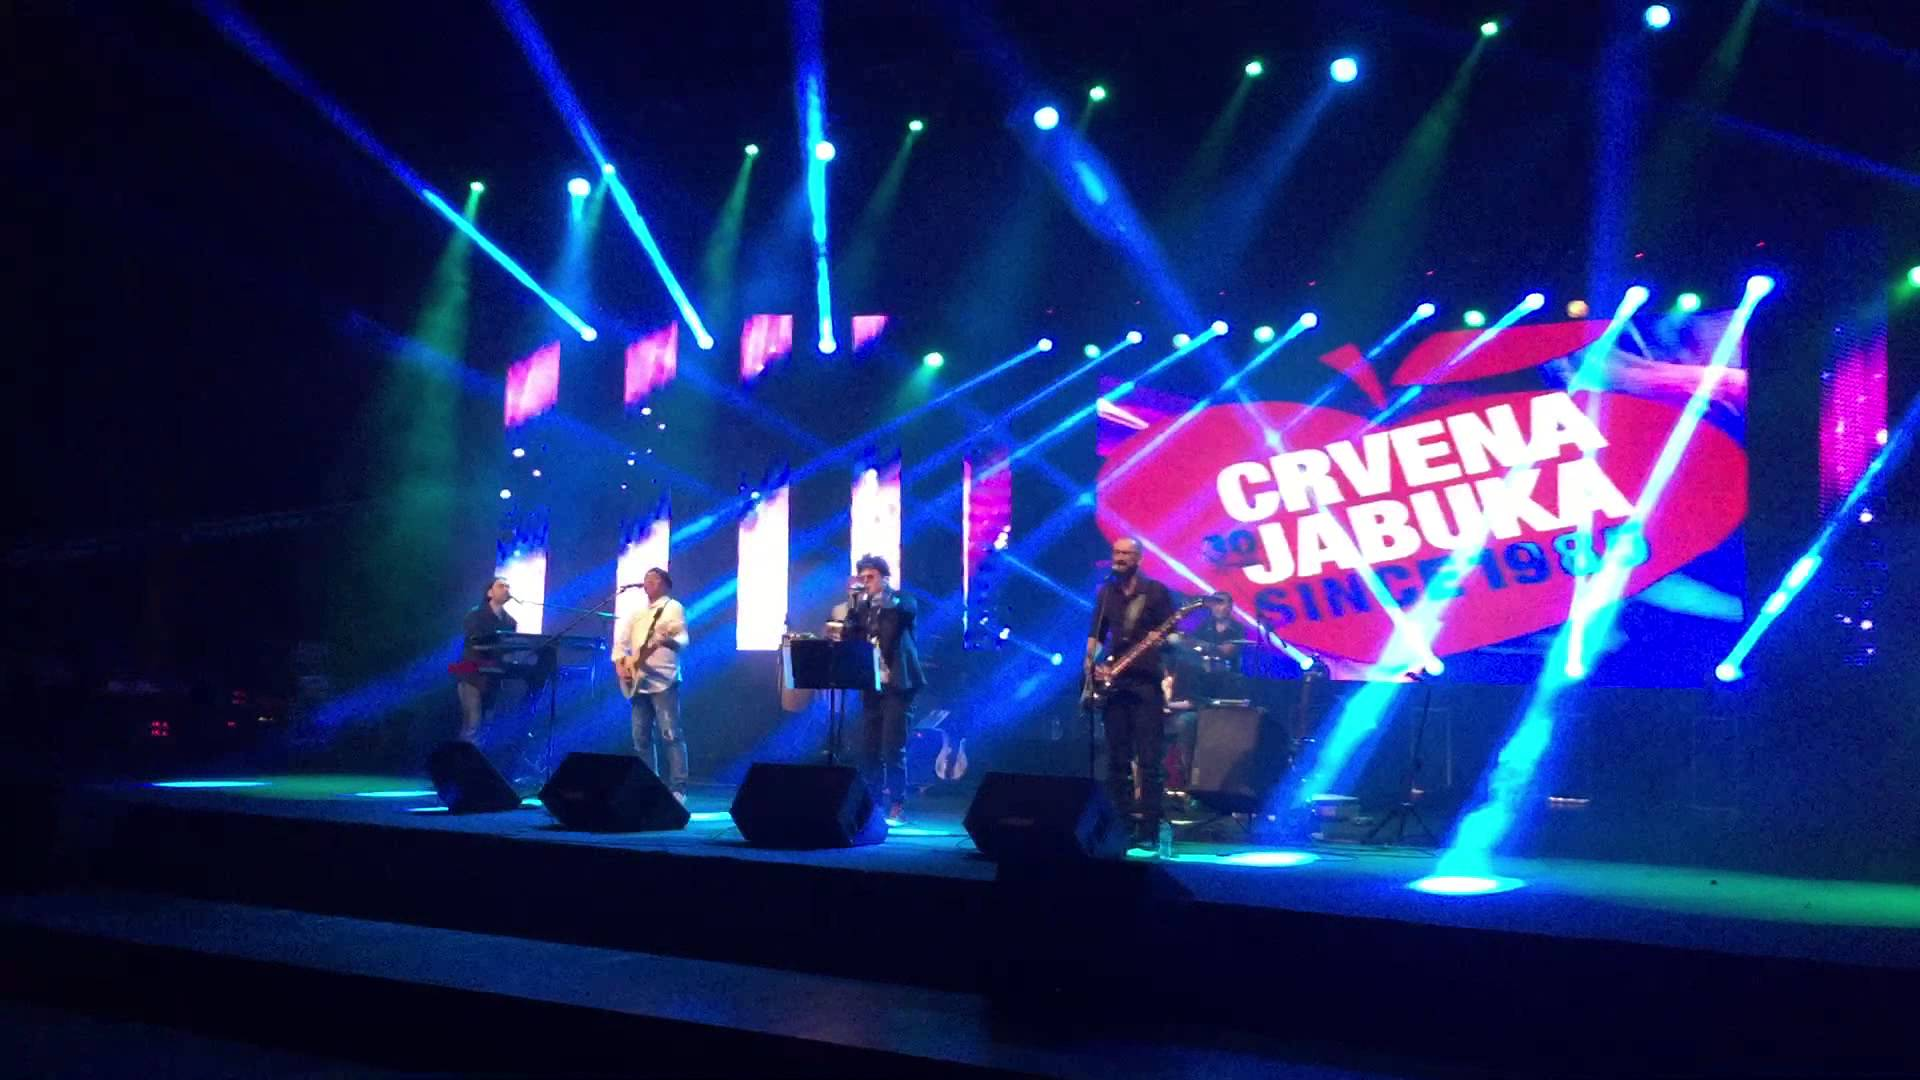 Crvena Jabuka, turneja, koncerti,Amerika i Kanada 2017